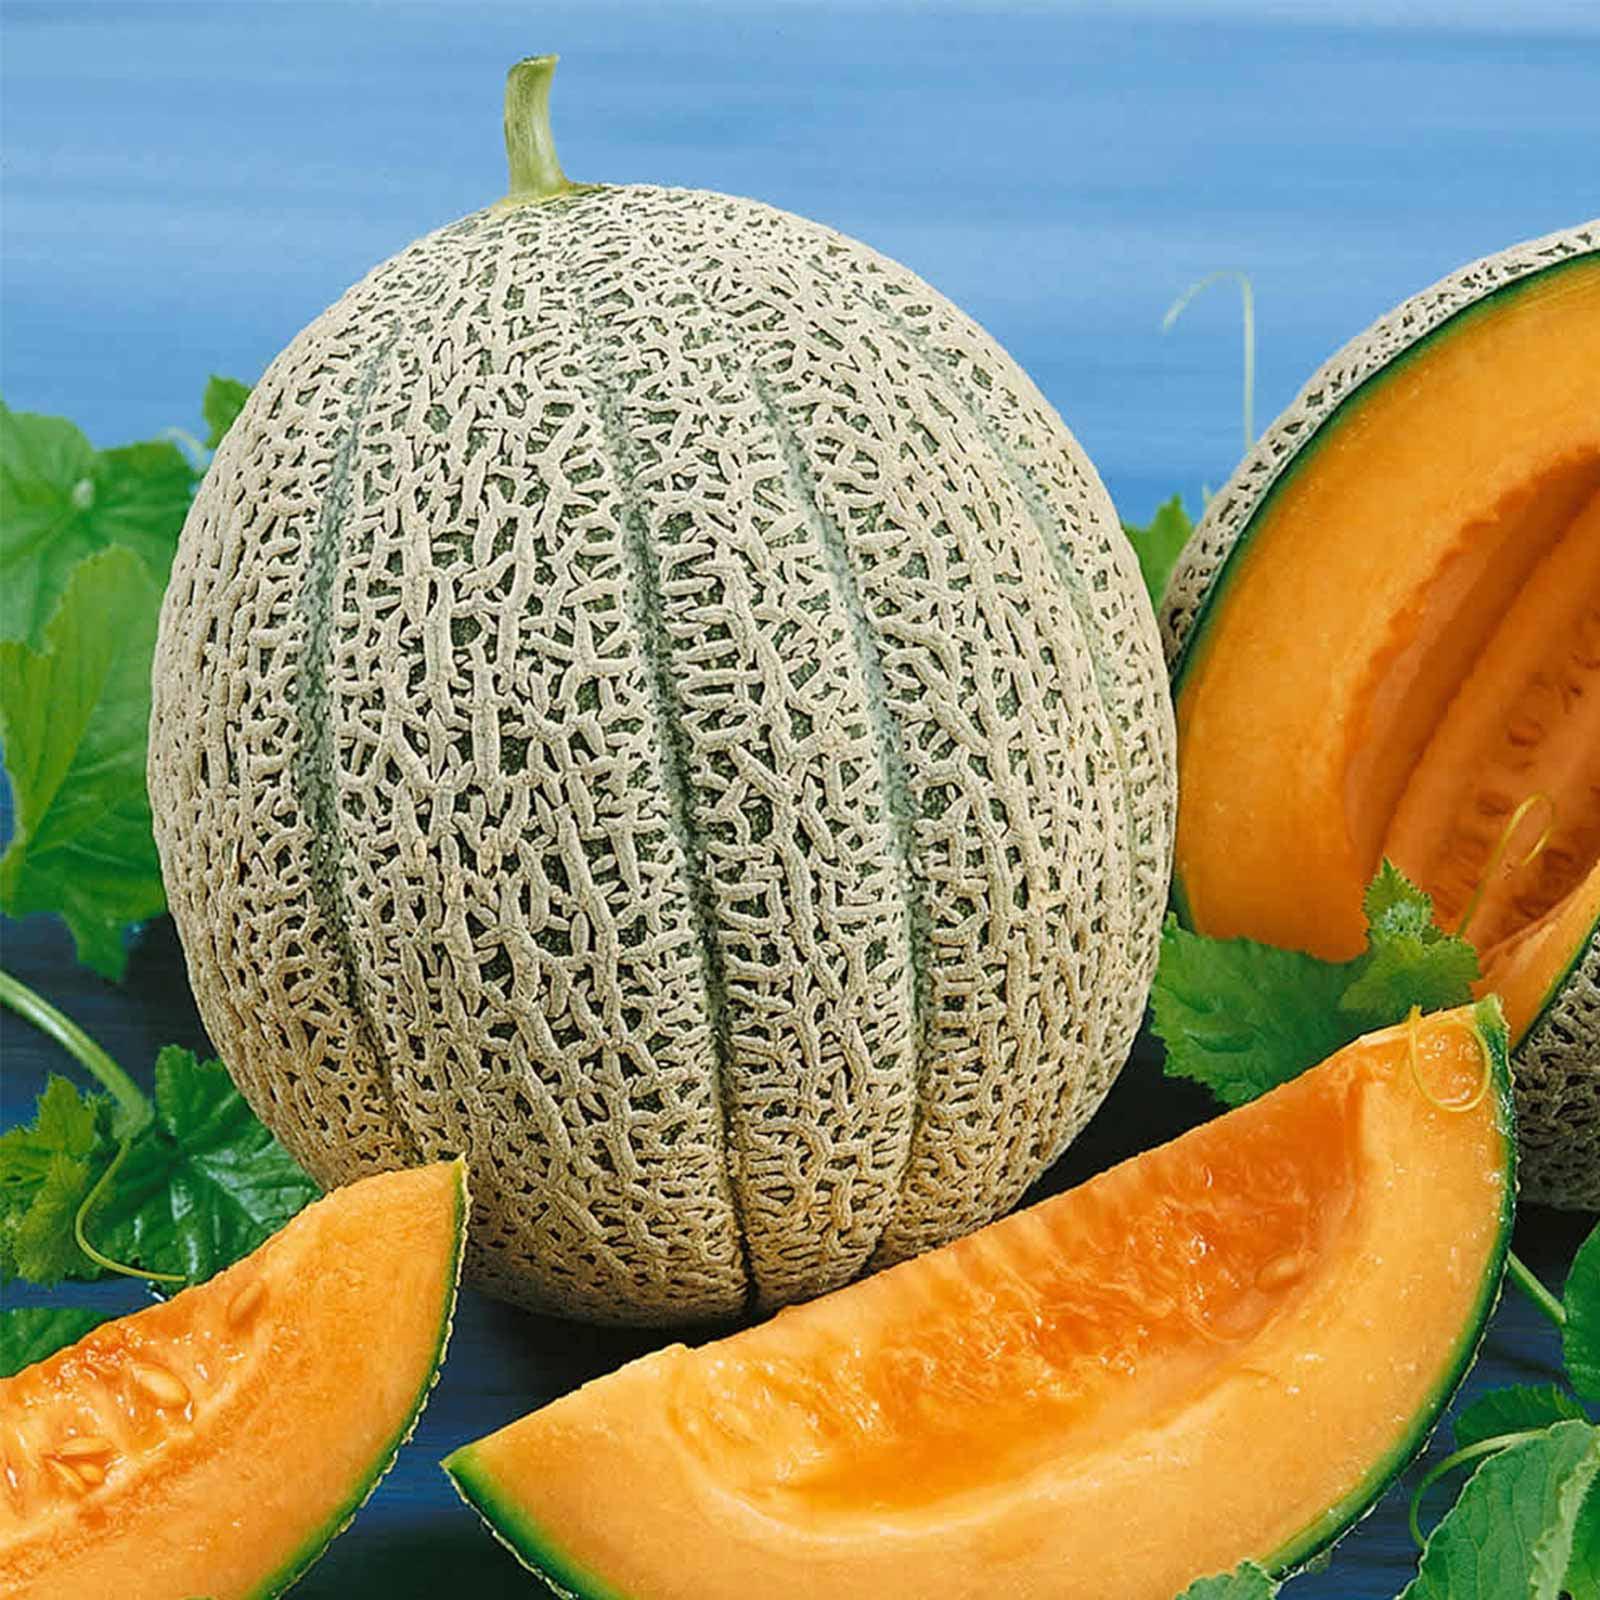 Cantaloupe Melon Garden Seeds - Hales Best Jumbo - 5 Lb Bulk - Non-GMO, Heirloom, Vegetable Gardening Seeds - Fruit